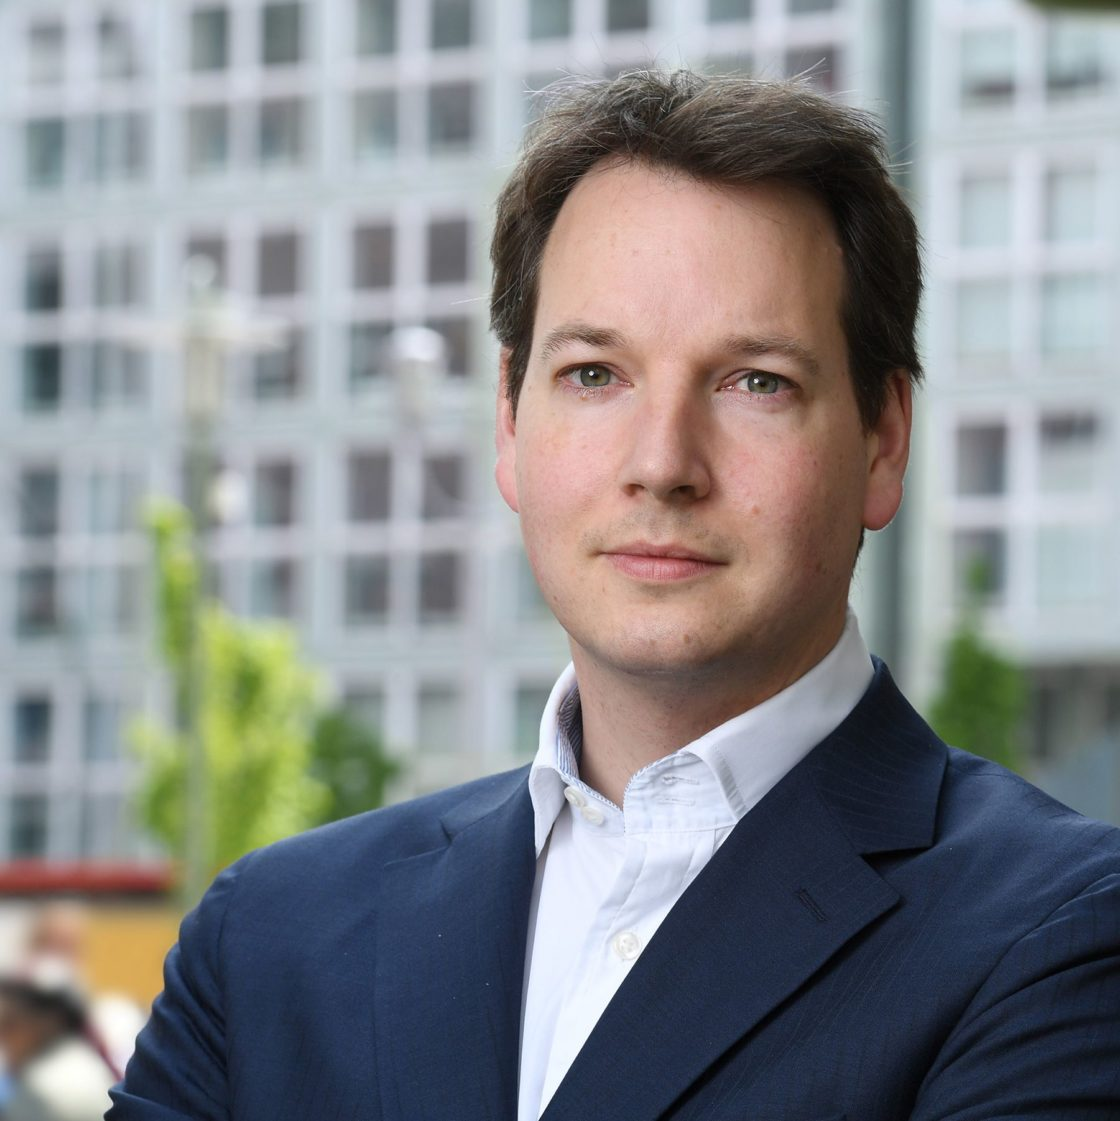 Foundations vote for Europe: Felix Oldenburg, DAFNE Chair